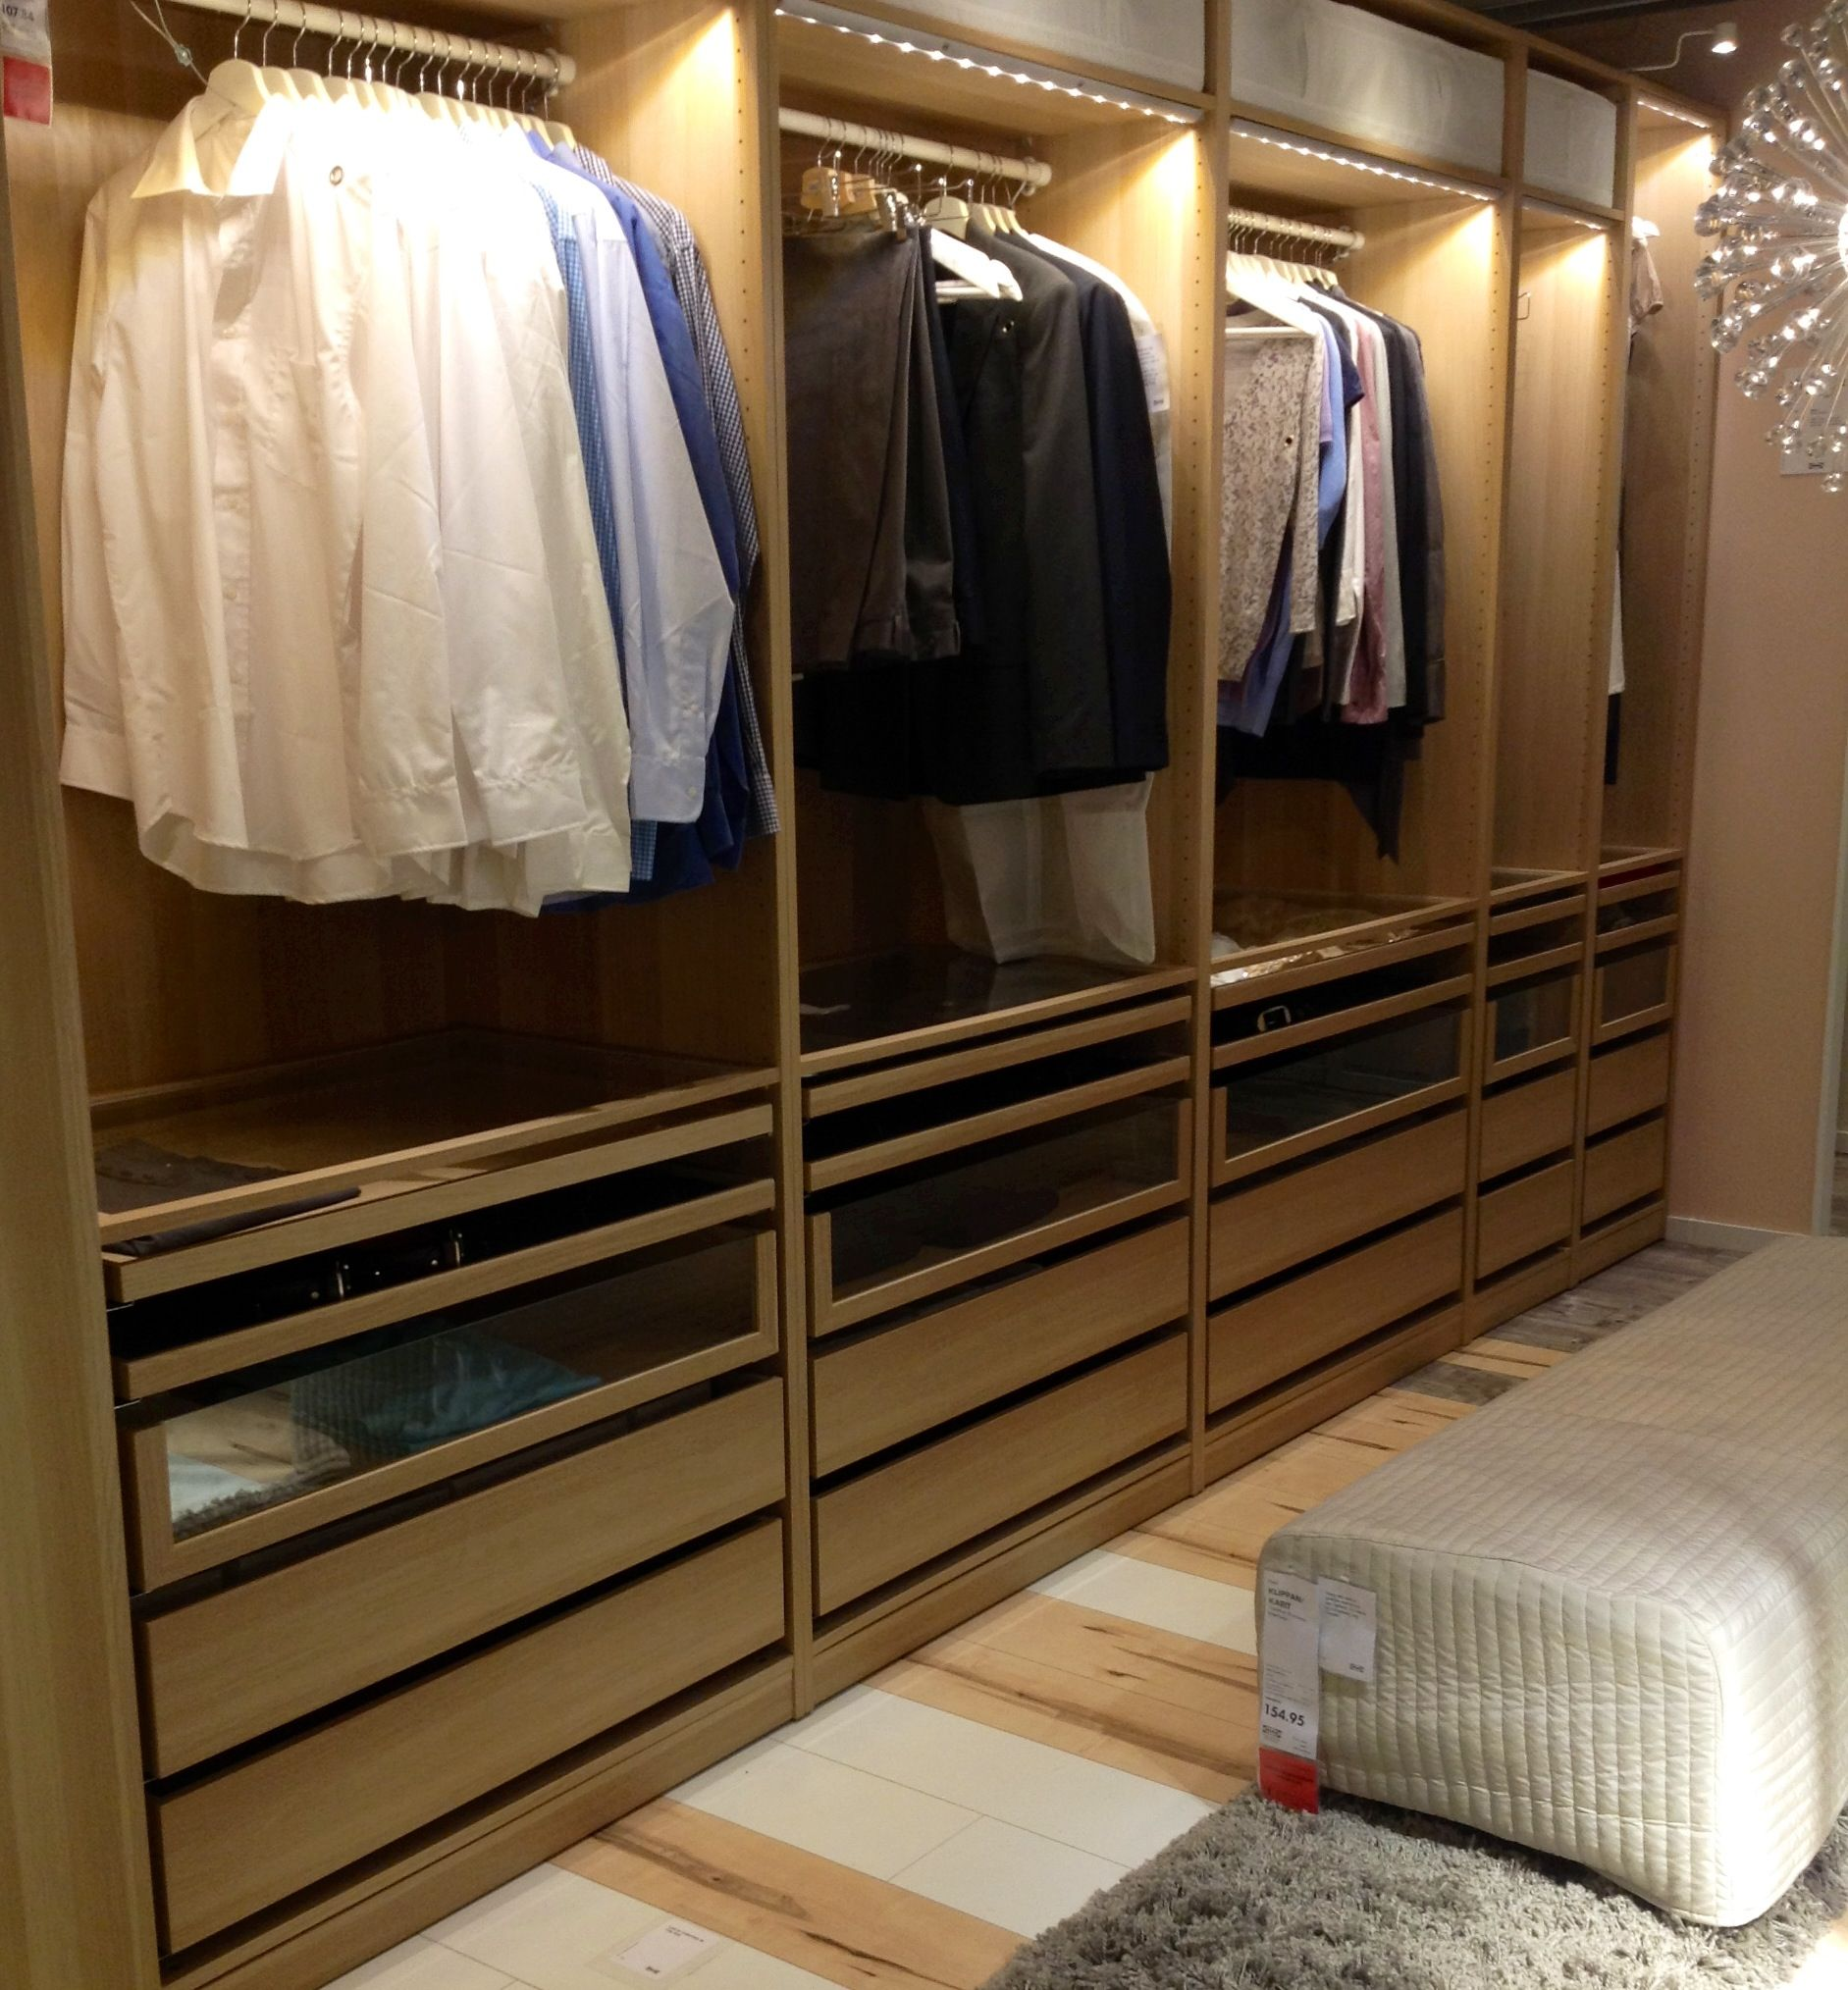 Walk In Closet PAX Wardrobe Solution. IKEA Amsterdam #interiordesign  #JanineJacobs